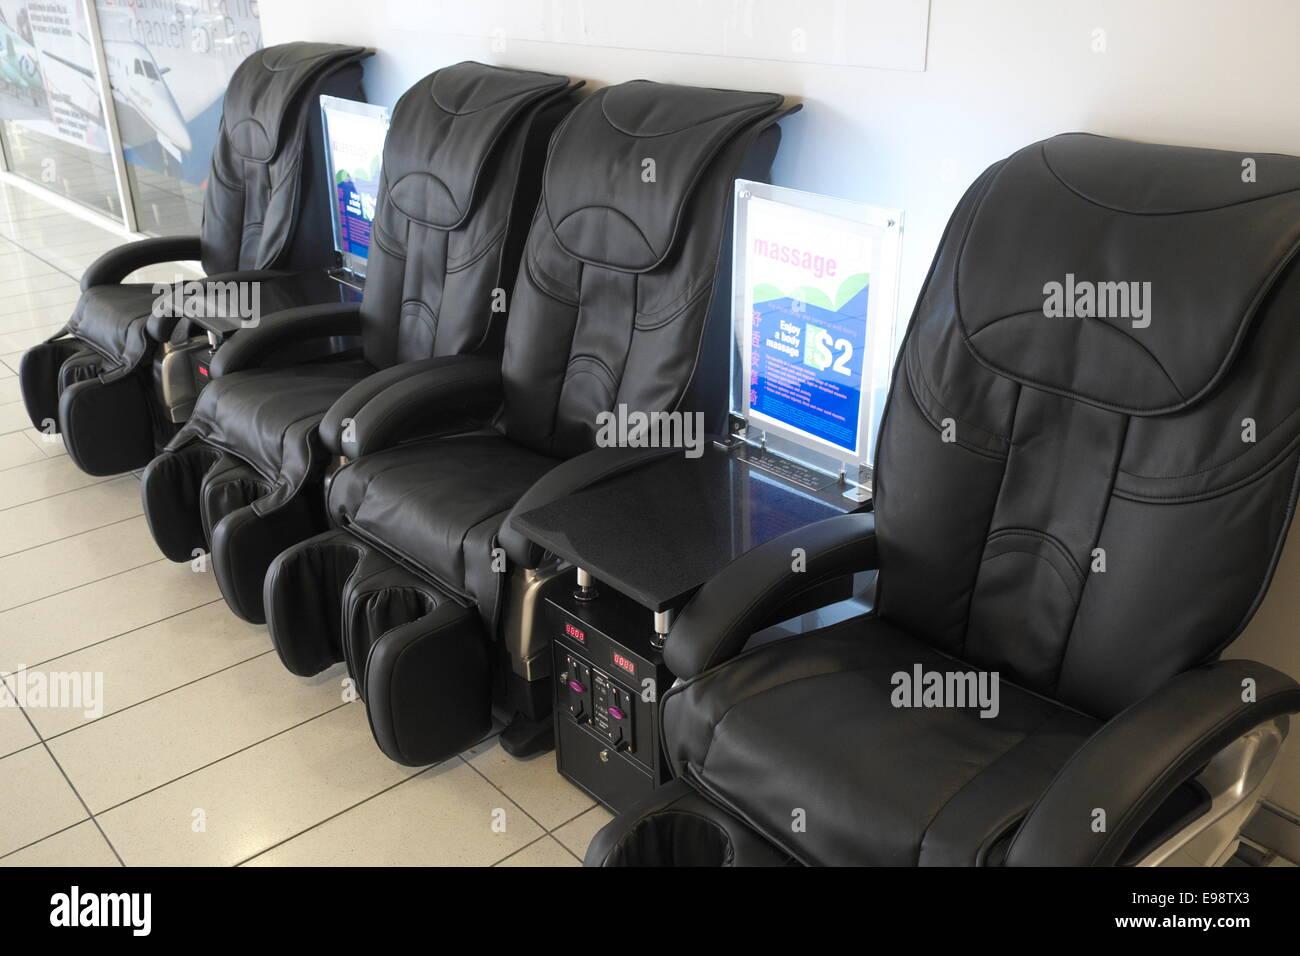 massage chair au. stock photo - backache massage chairs at sydney airport,australia chair au